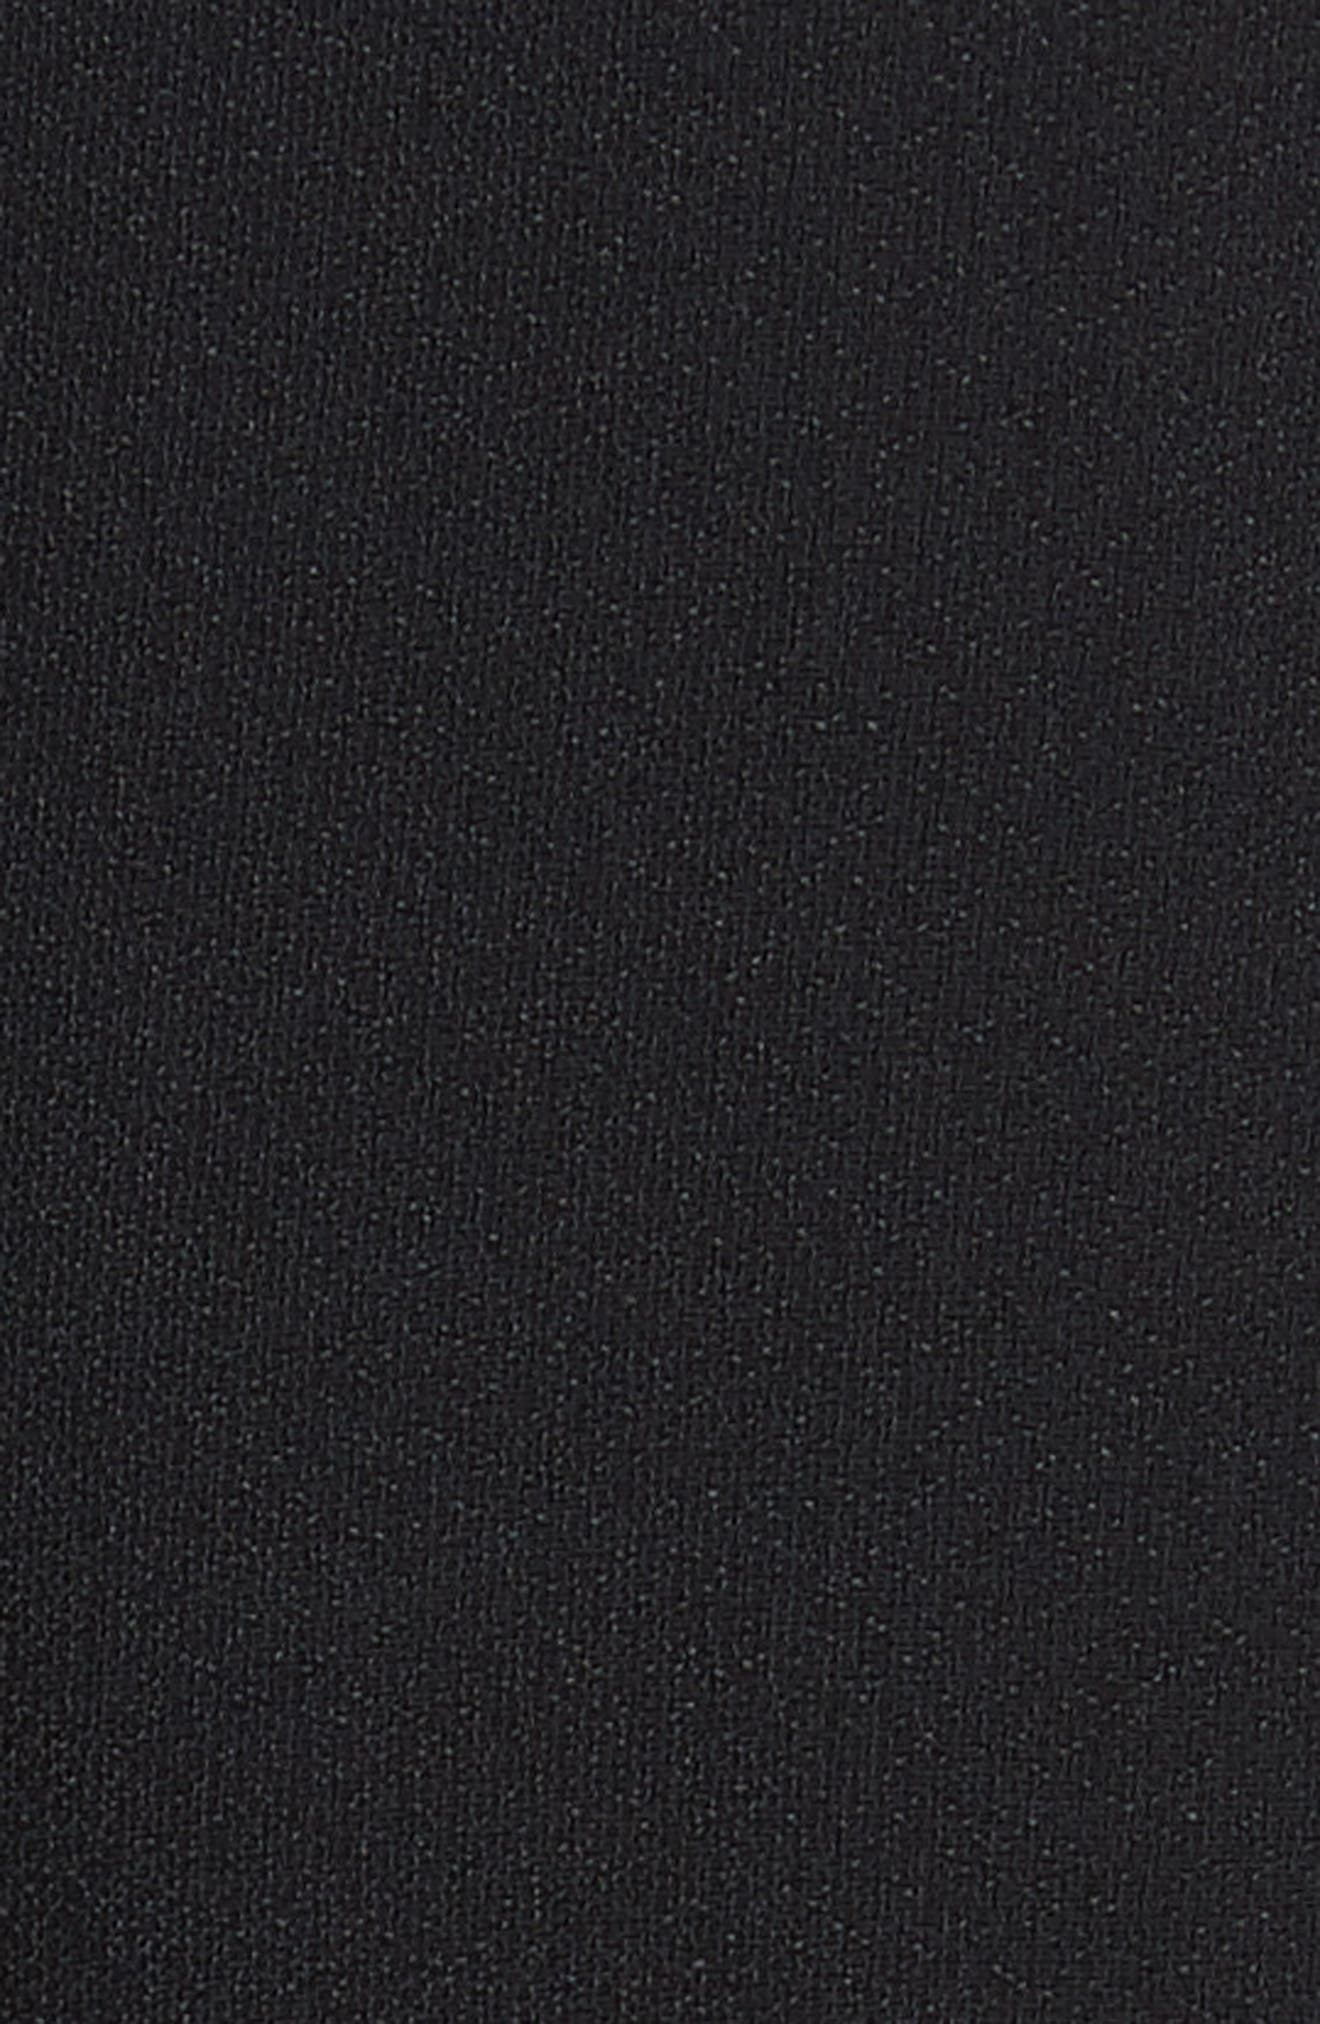 Fringe Hem Turtleneck,                             Alternate thumbnail 5, color,                             Black